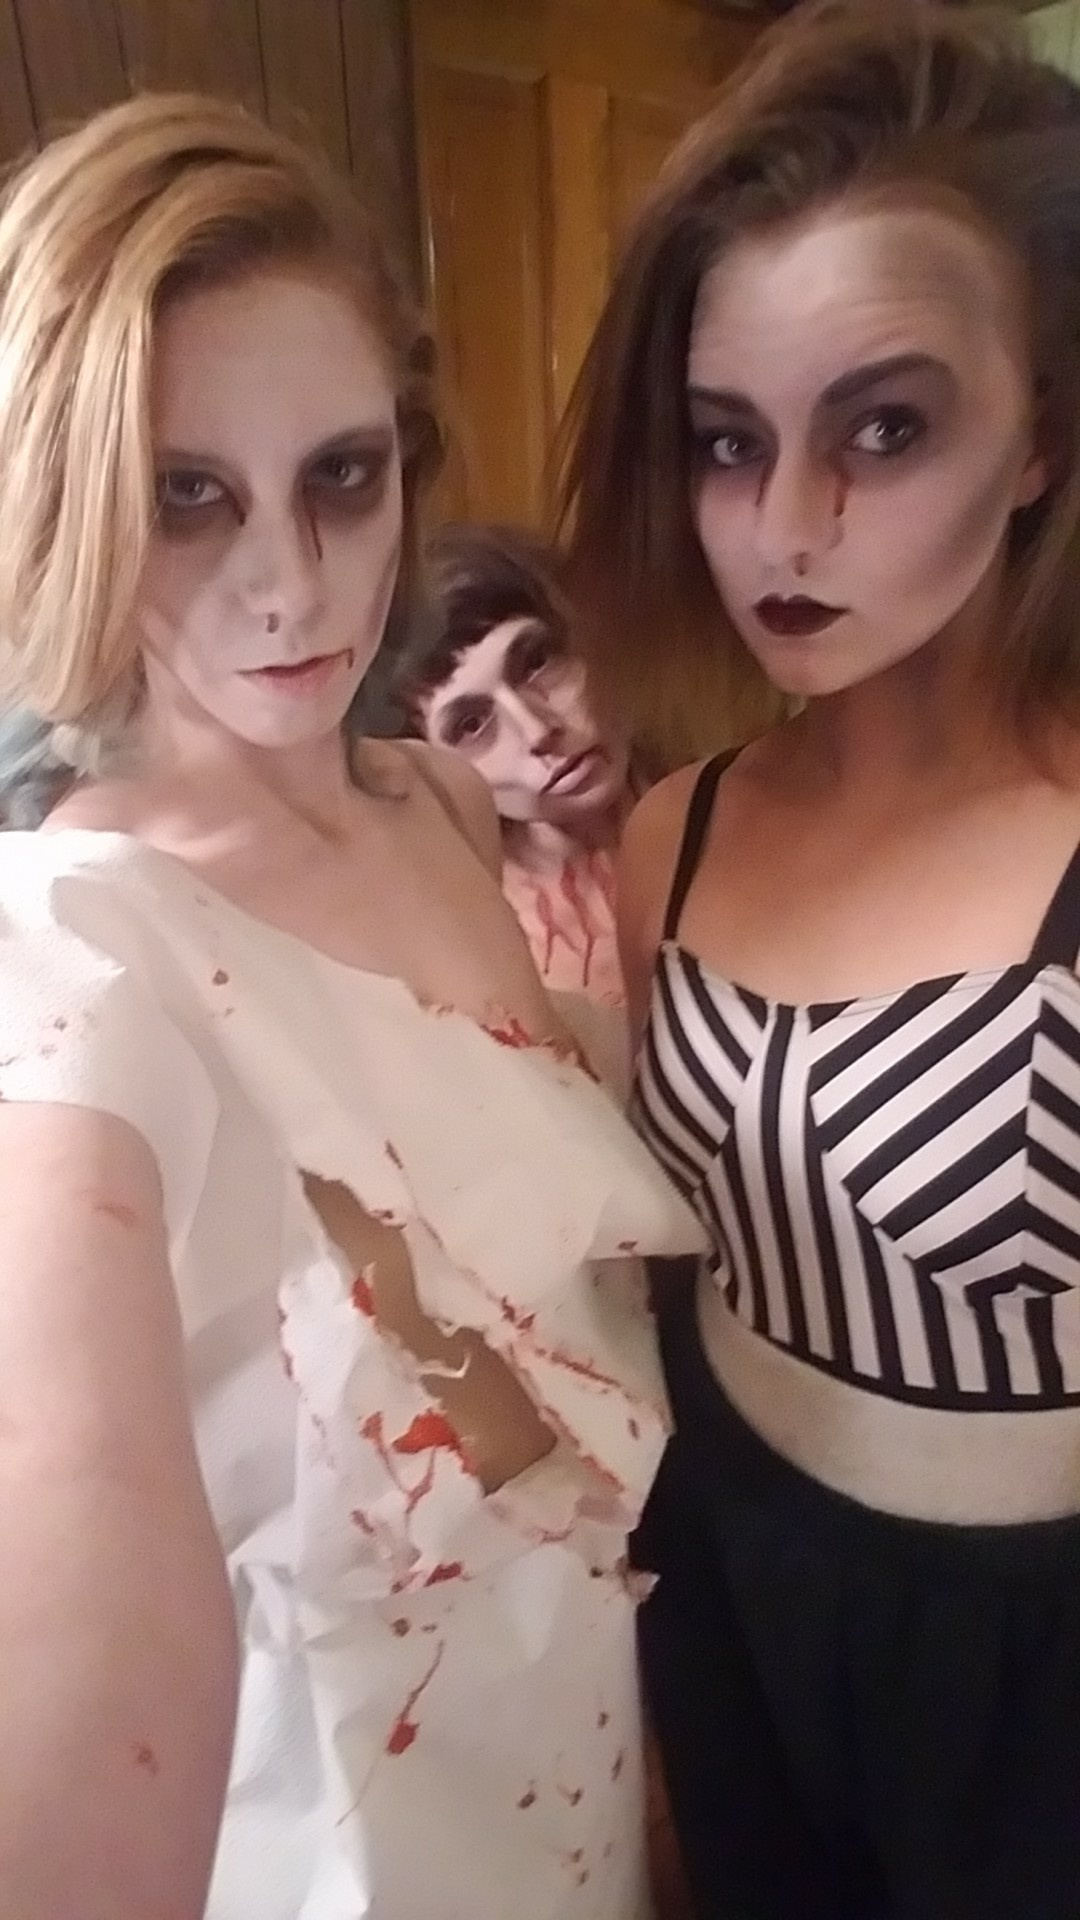 Creepy Ellen and Sydney